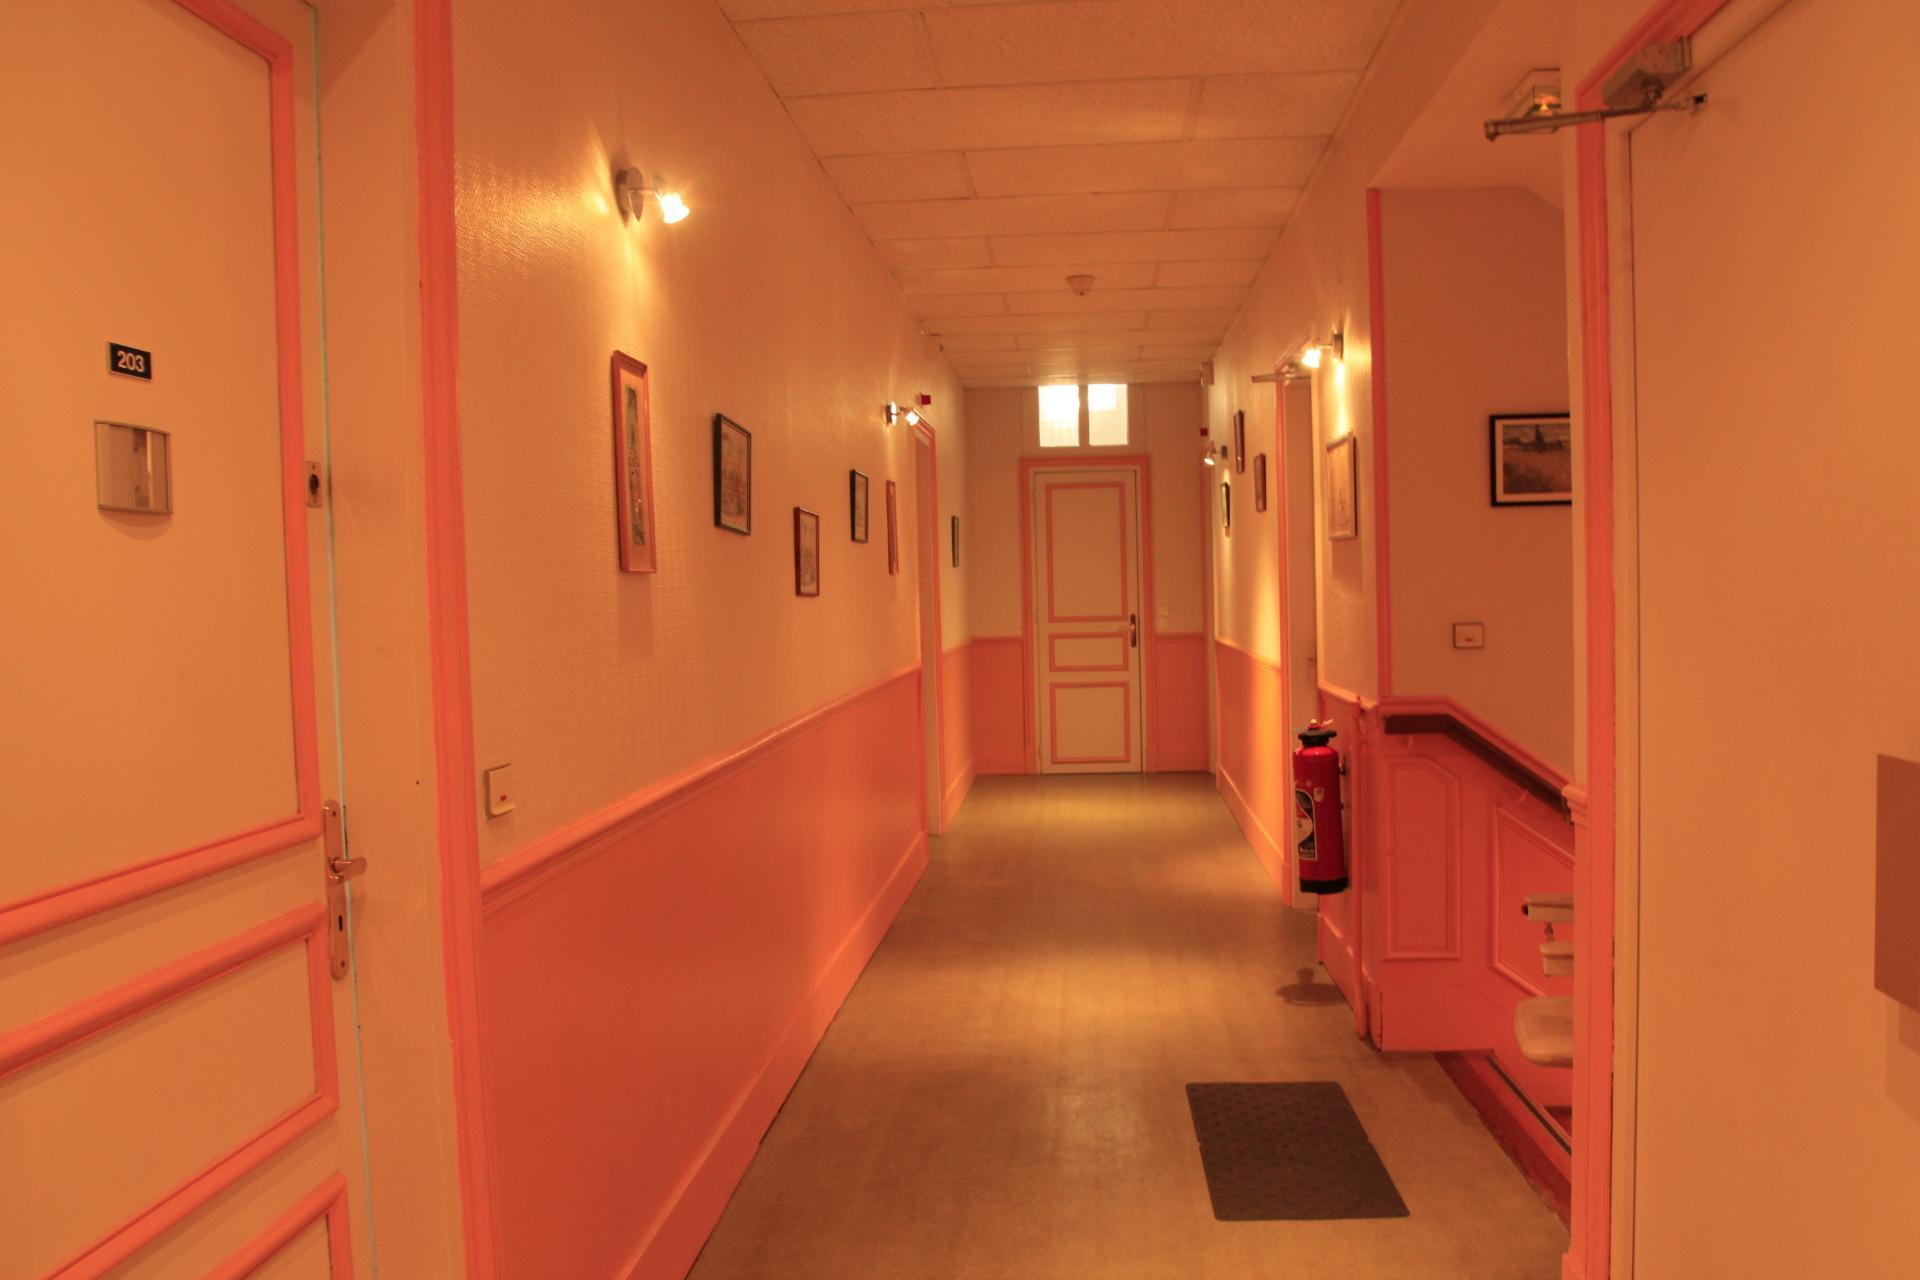 Couloir etage résidence sénior maison de retraite Ma Vallée Us Val d'Oise 95